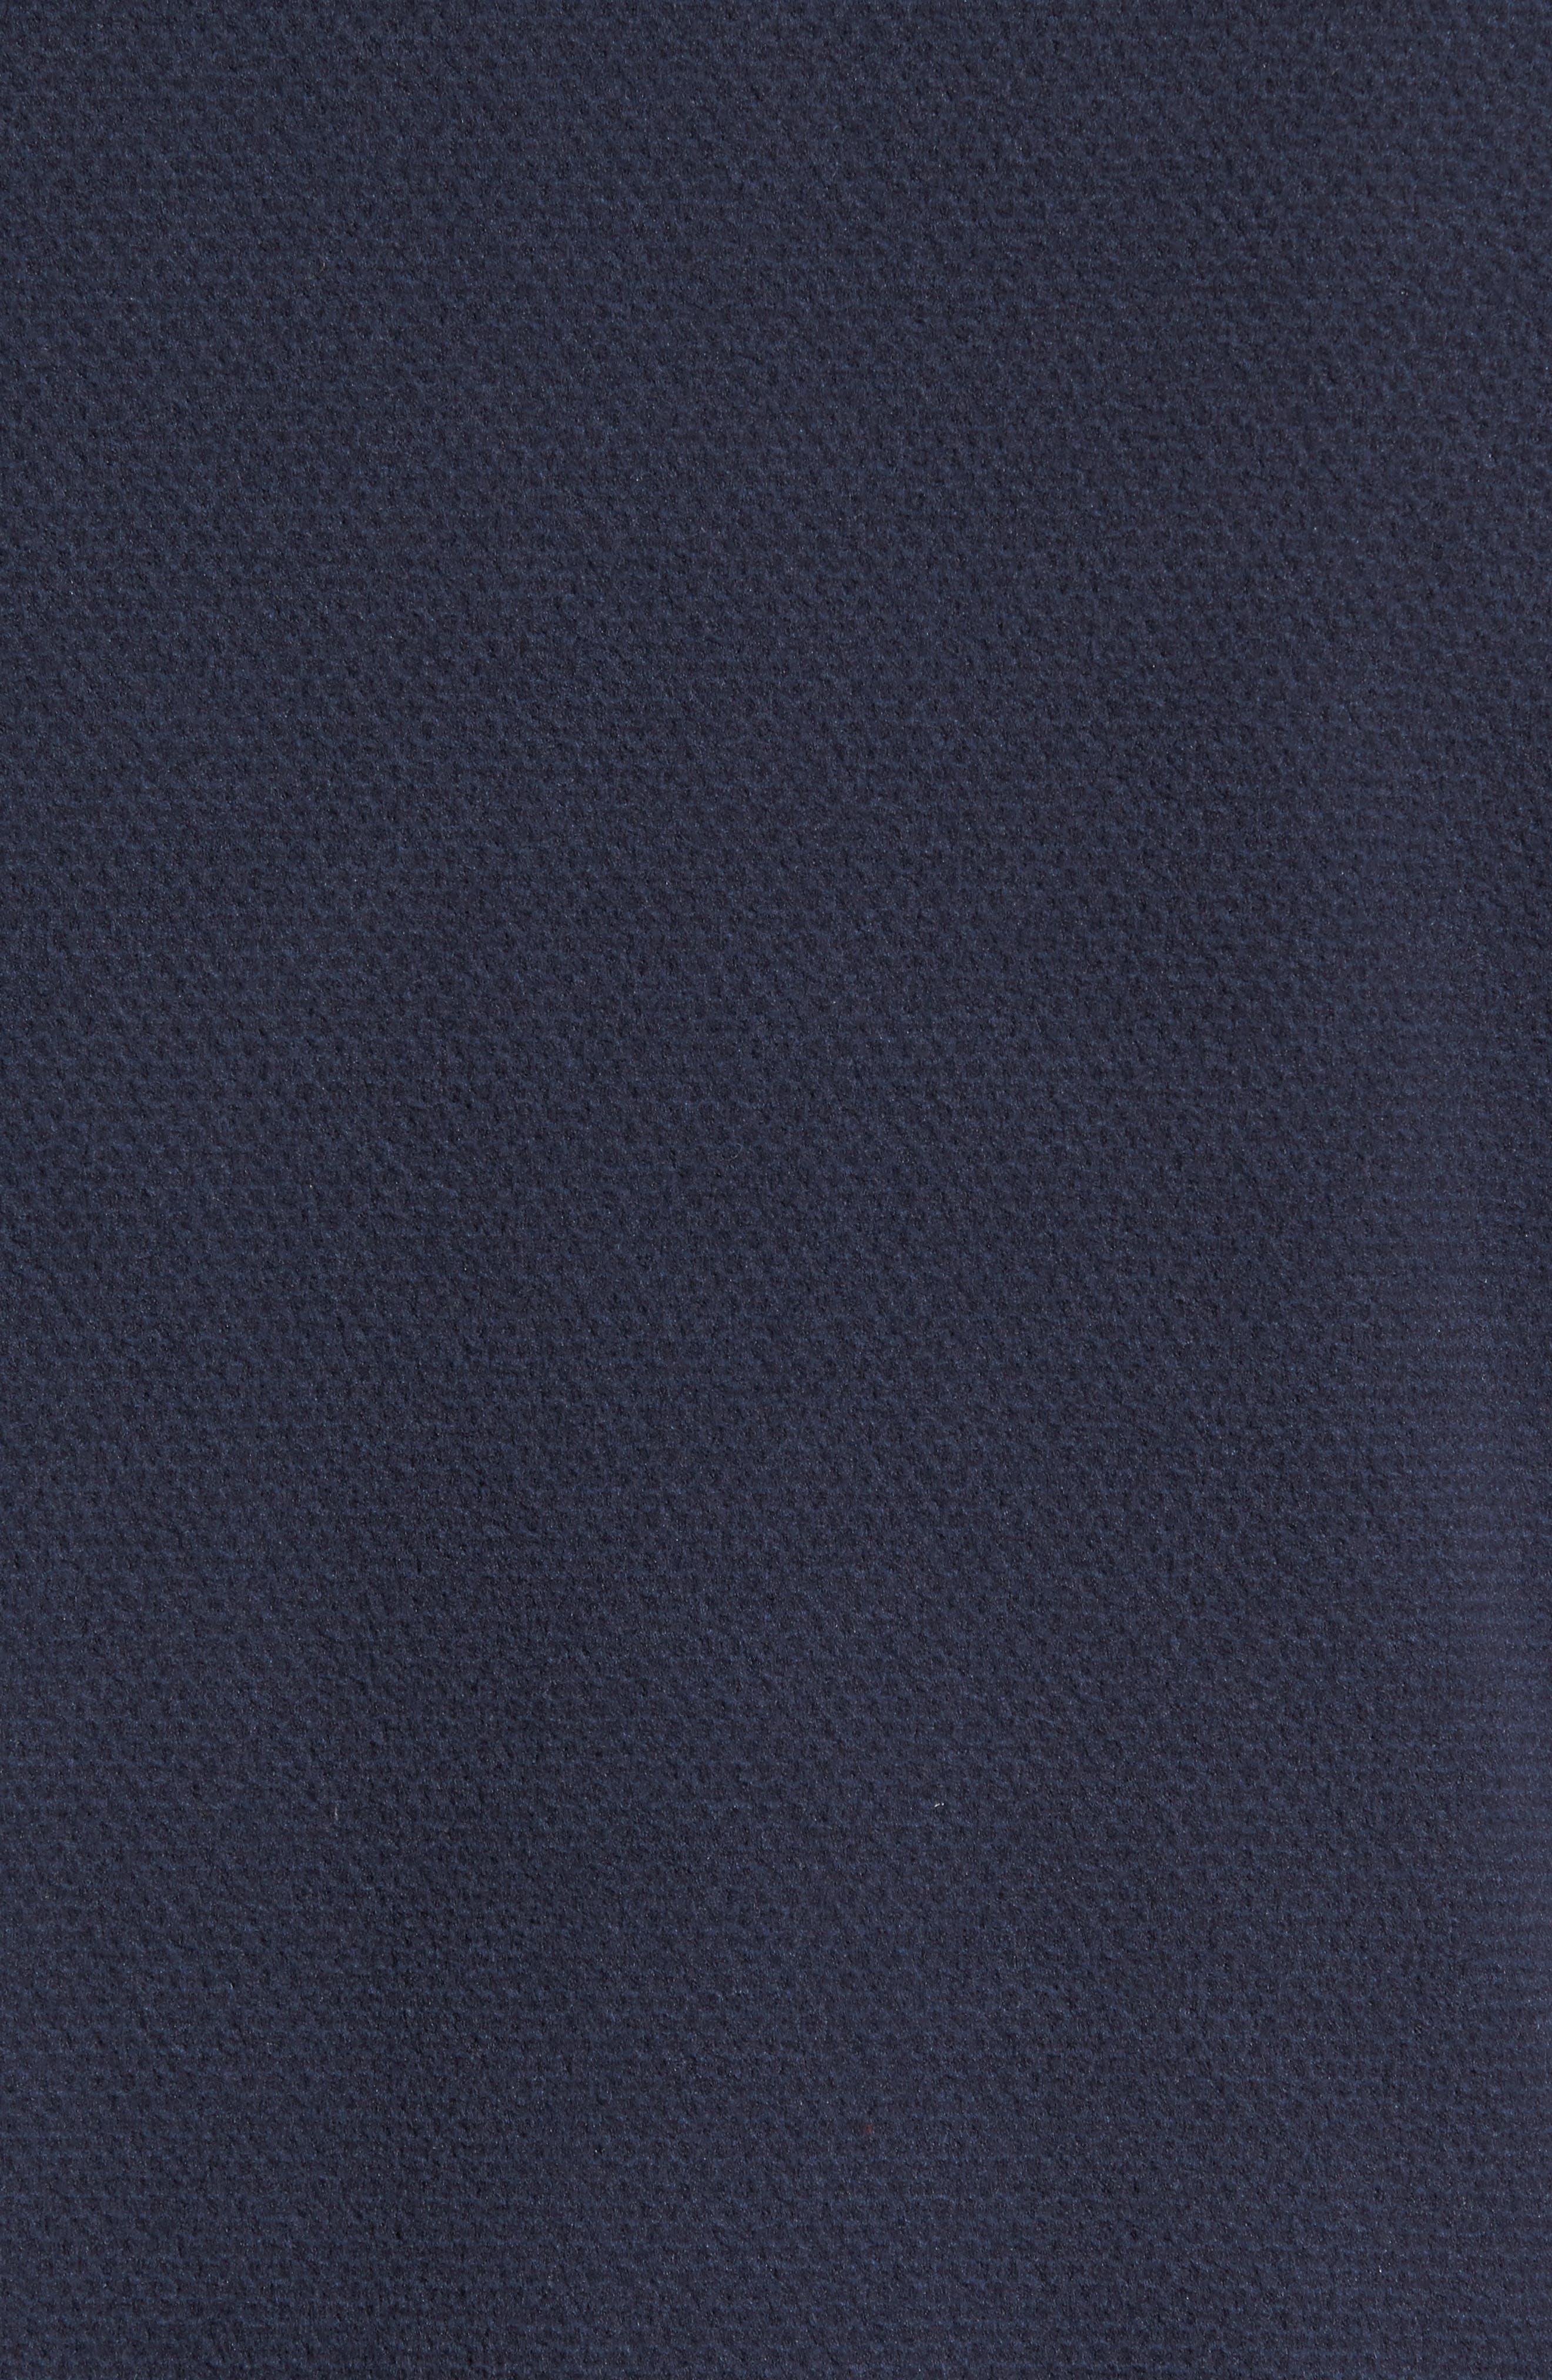 Texture Cap Rock Quarter Zip Fleece Jacket,                             Alternate thumbnail 5, color,                             Urban Navy Texture